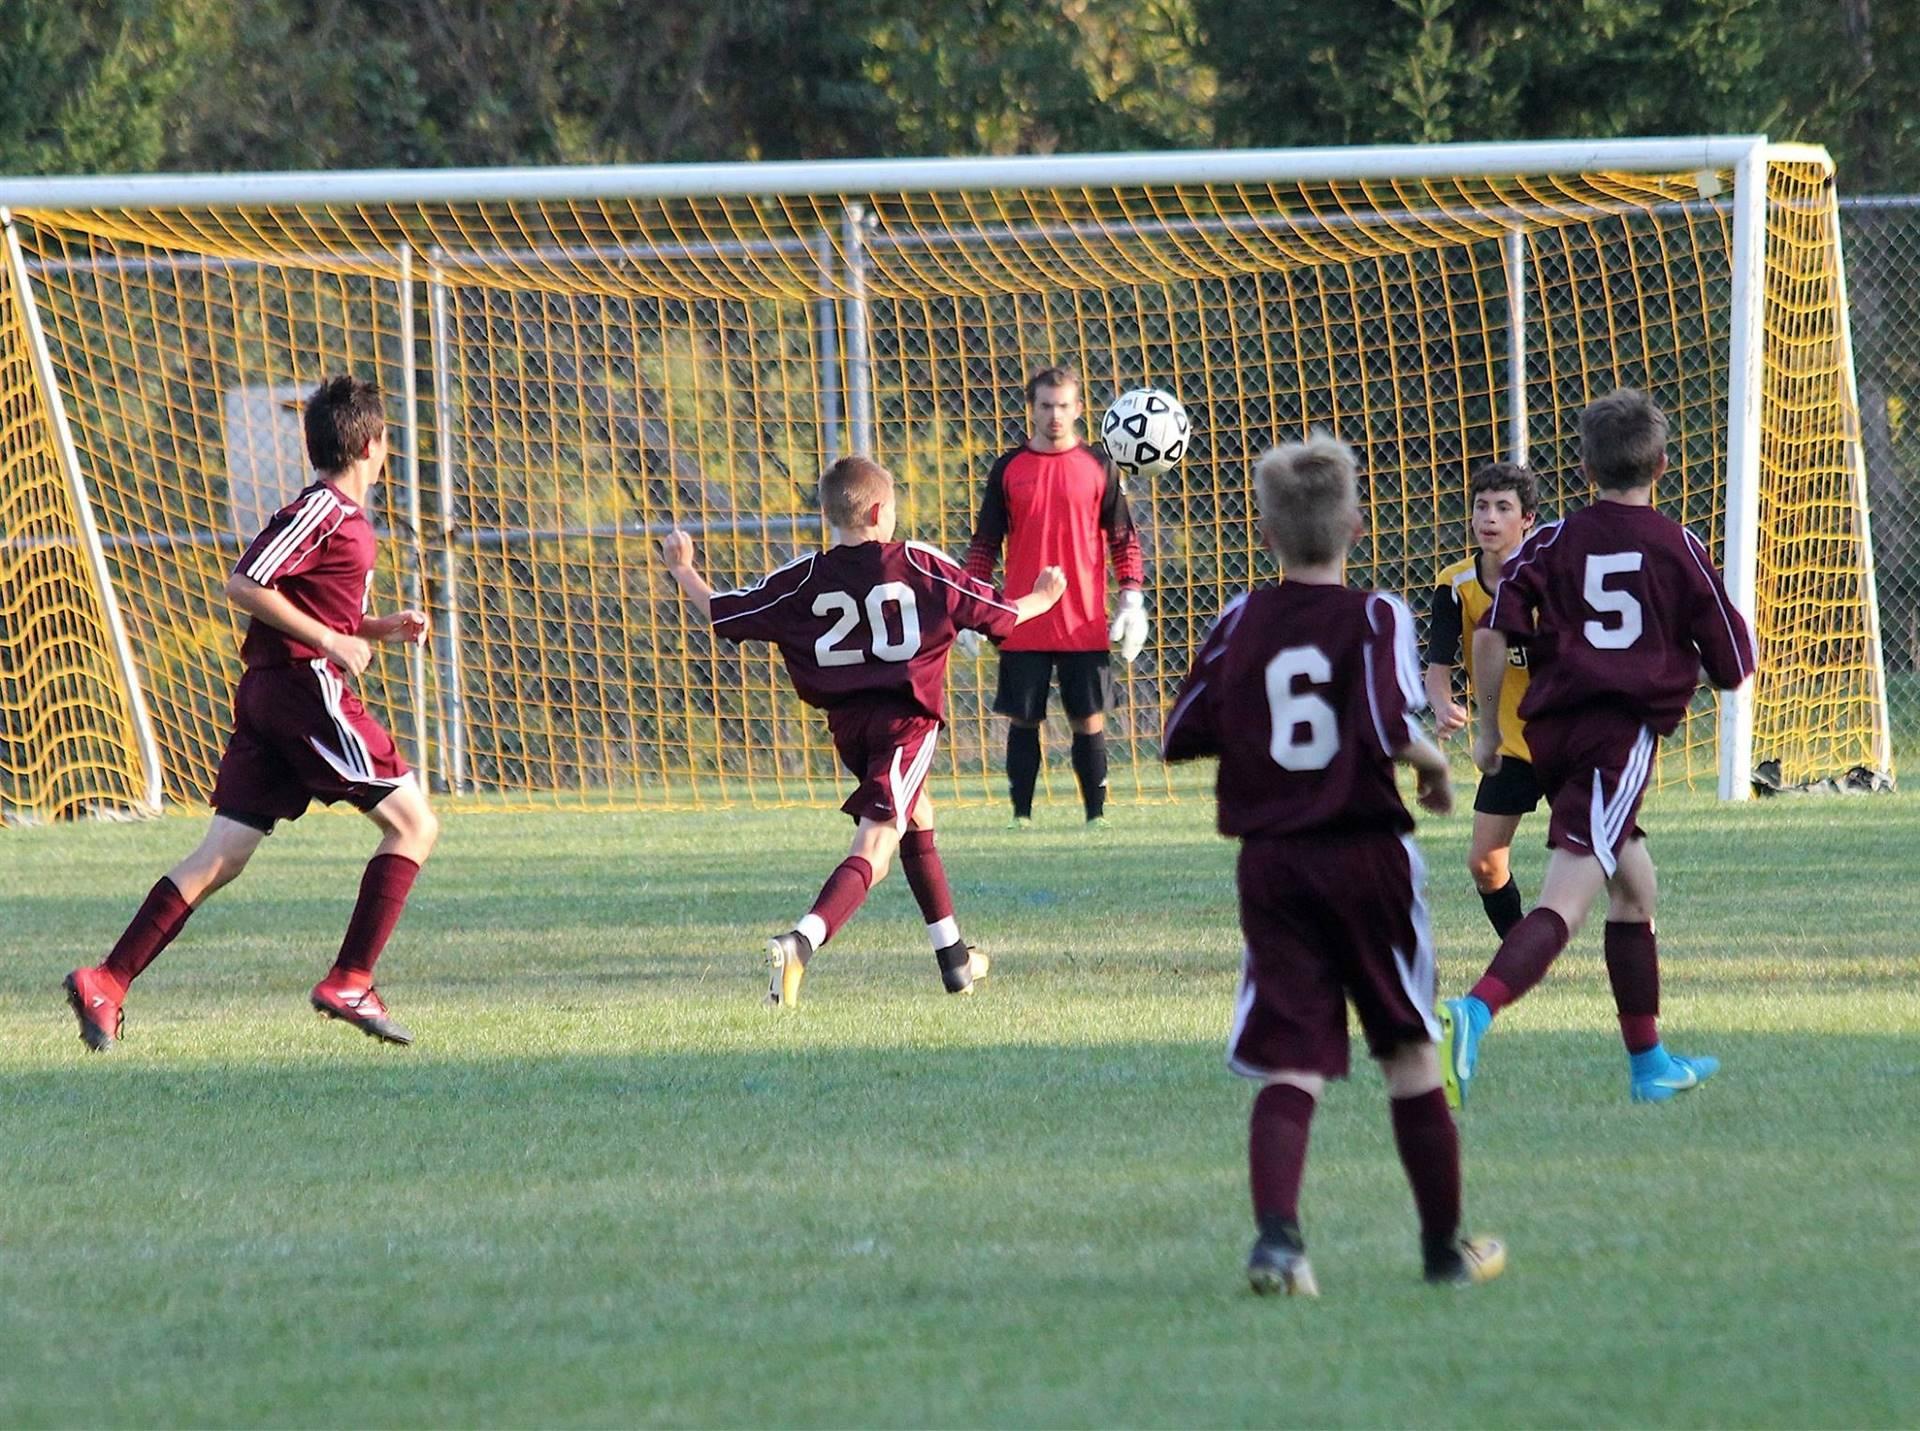 MS Boy's Soccer - Taking a shot!